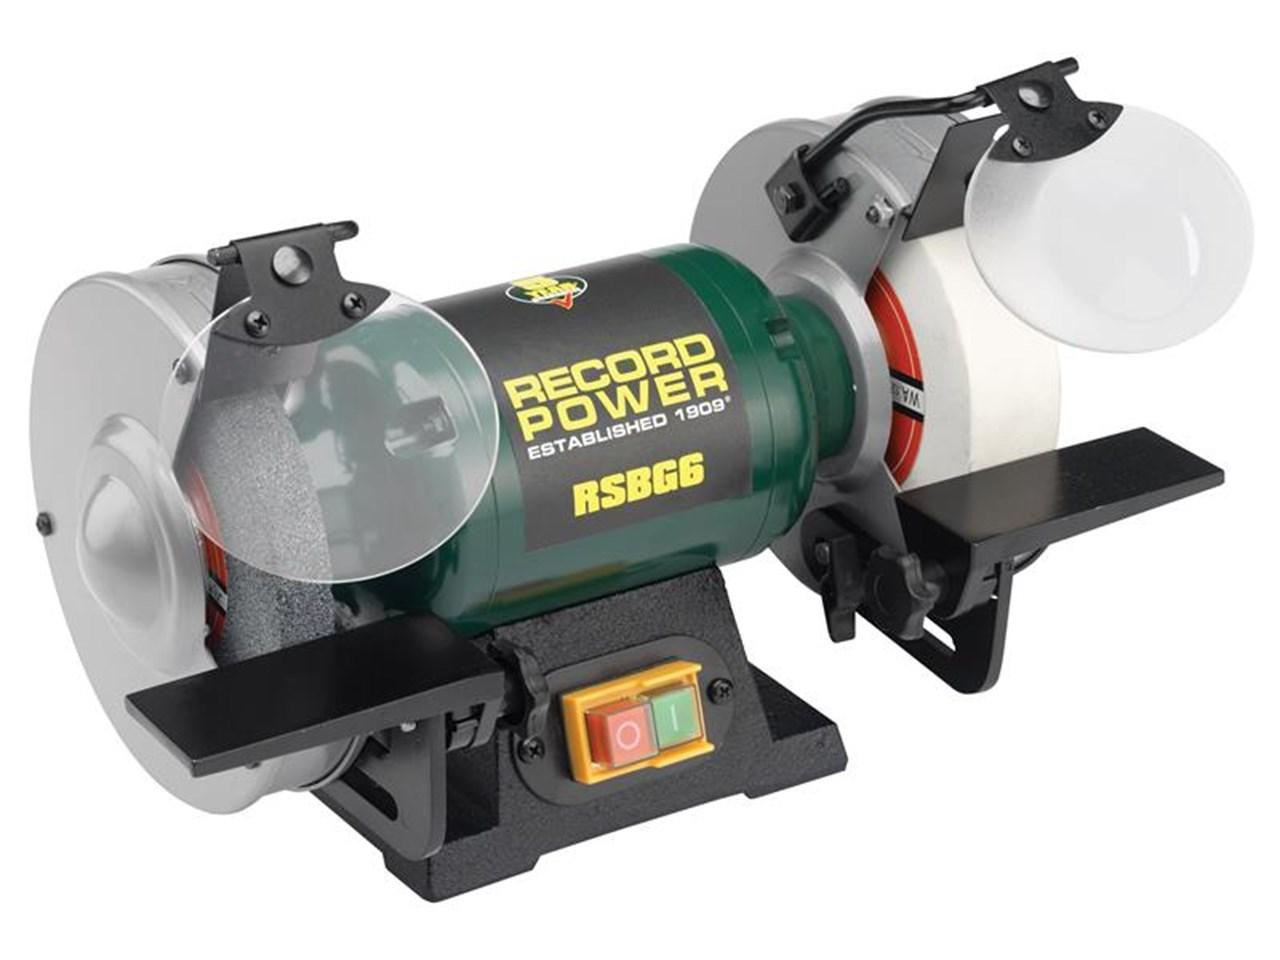 Record Power Rsbg8 240v Bench Grinder 8in